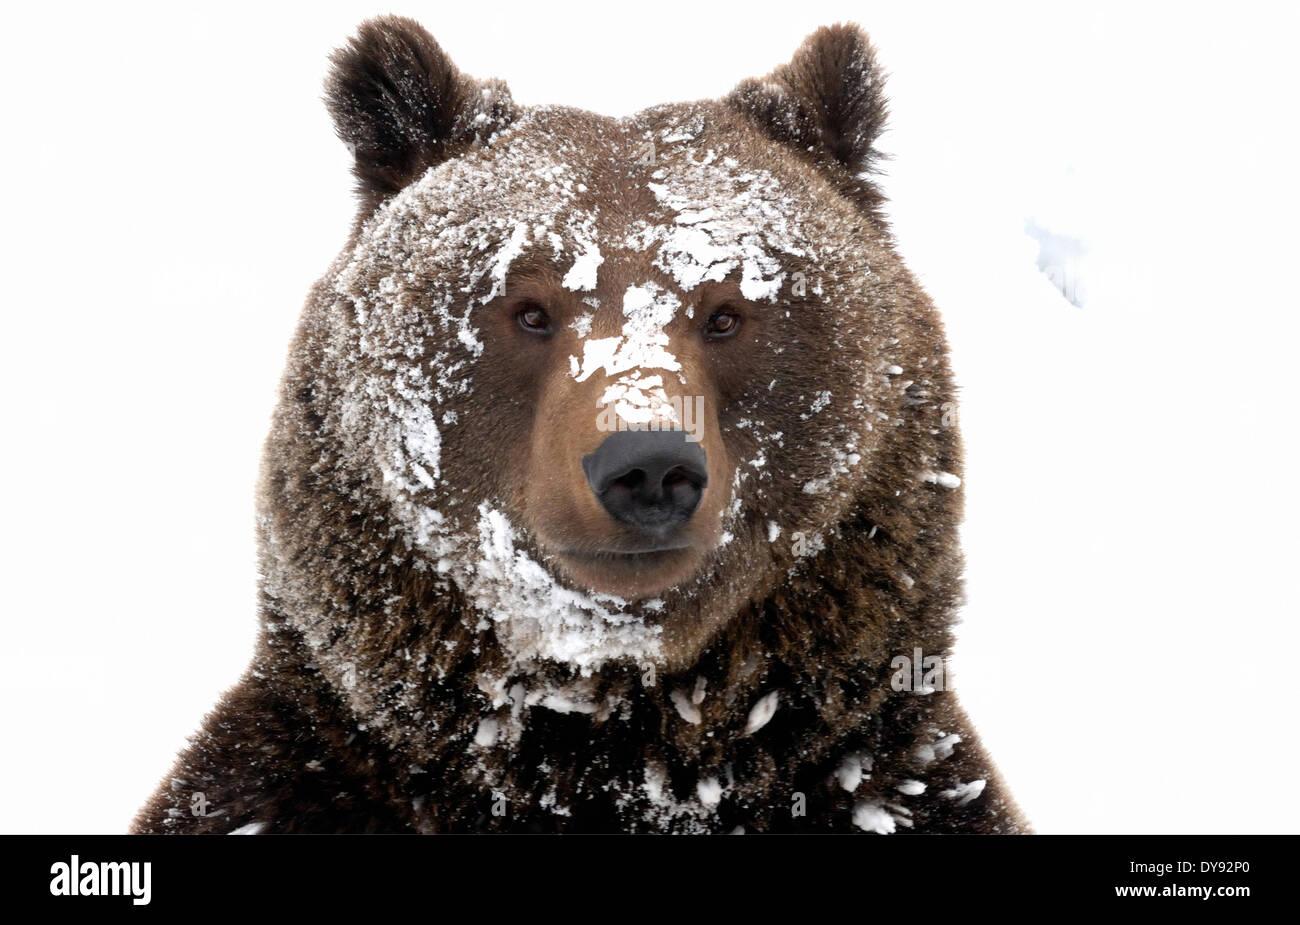 Ours brun ours ours brun européen européen prédateur Ursus arctos Ursus hiver neige hiver furtivement de l'ours, animal animaux Photo Stock